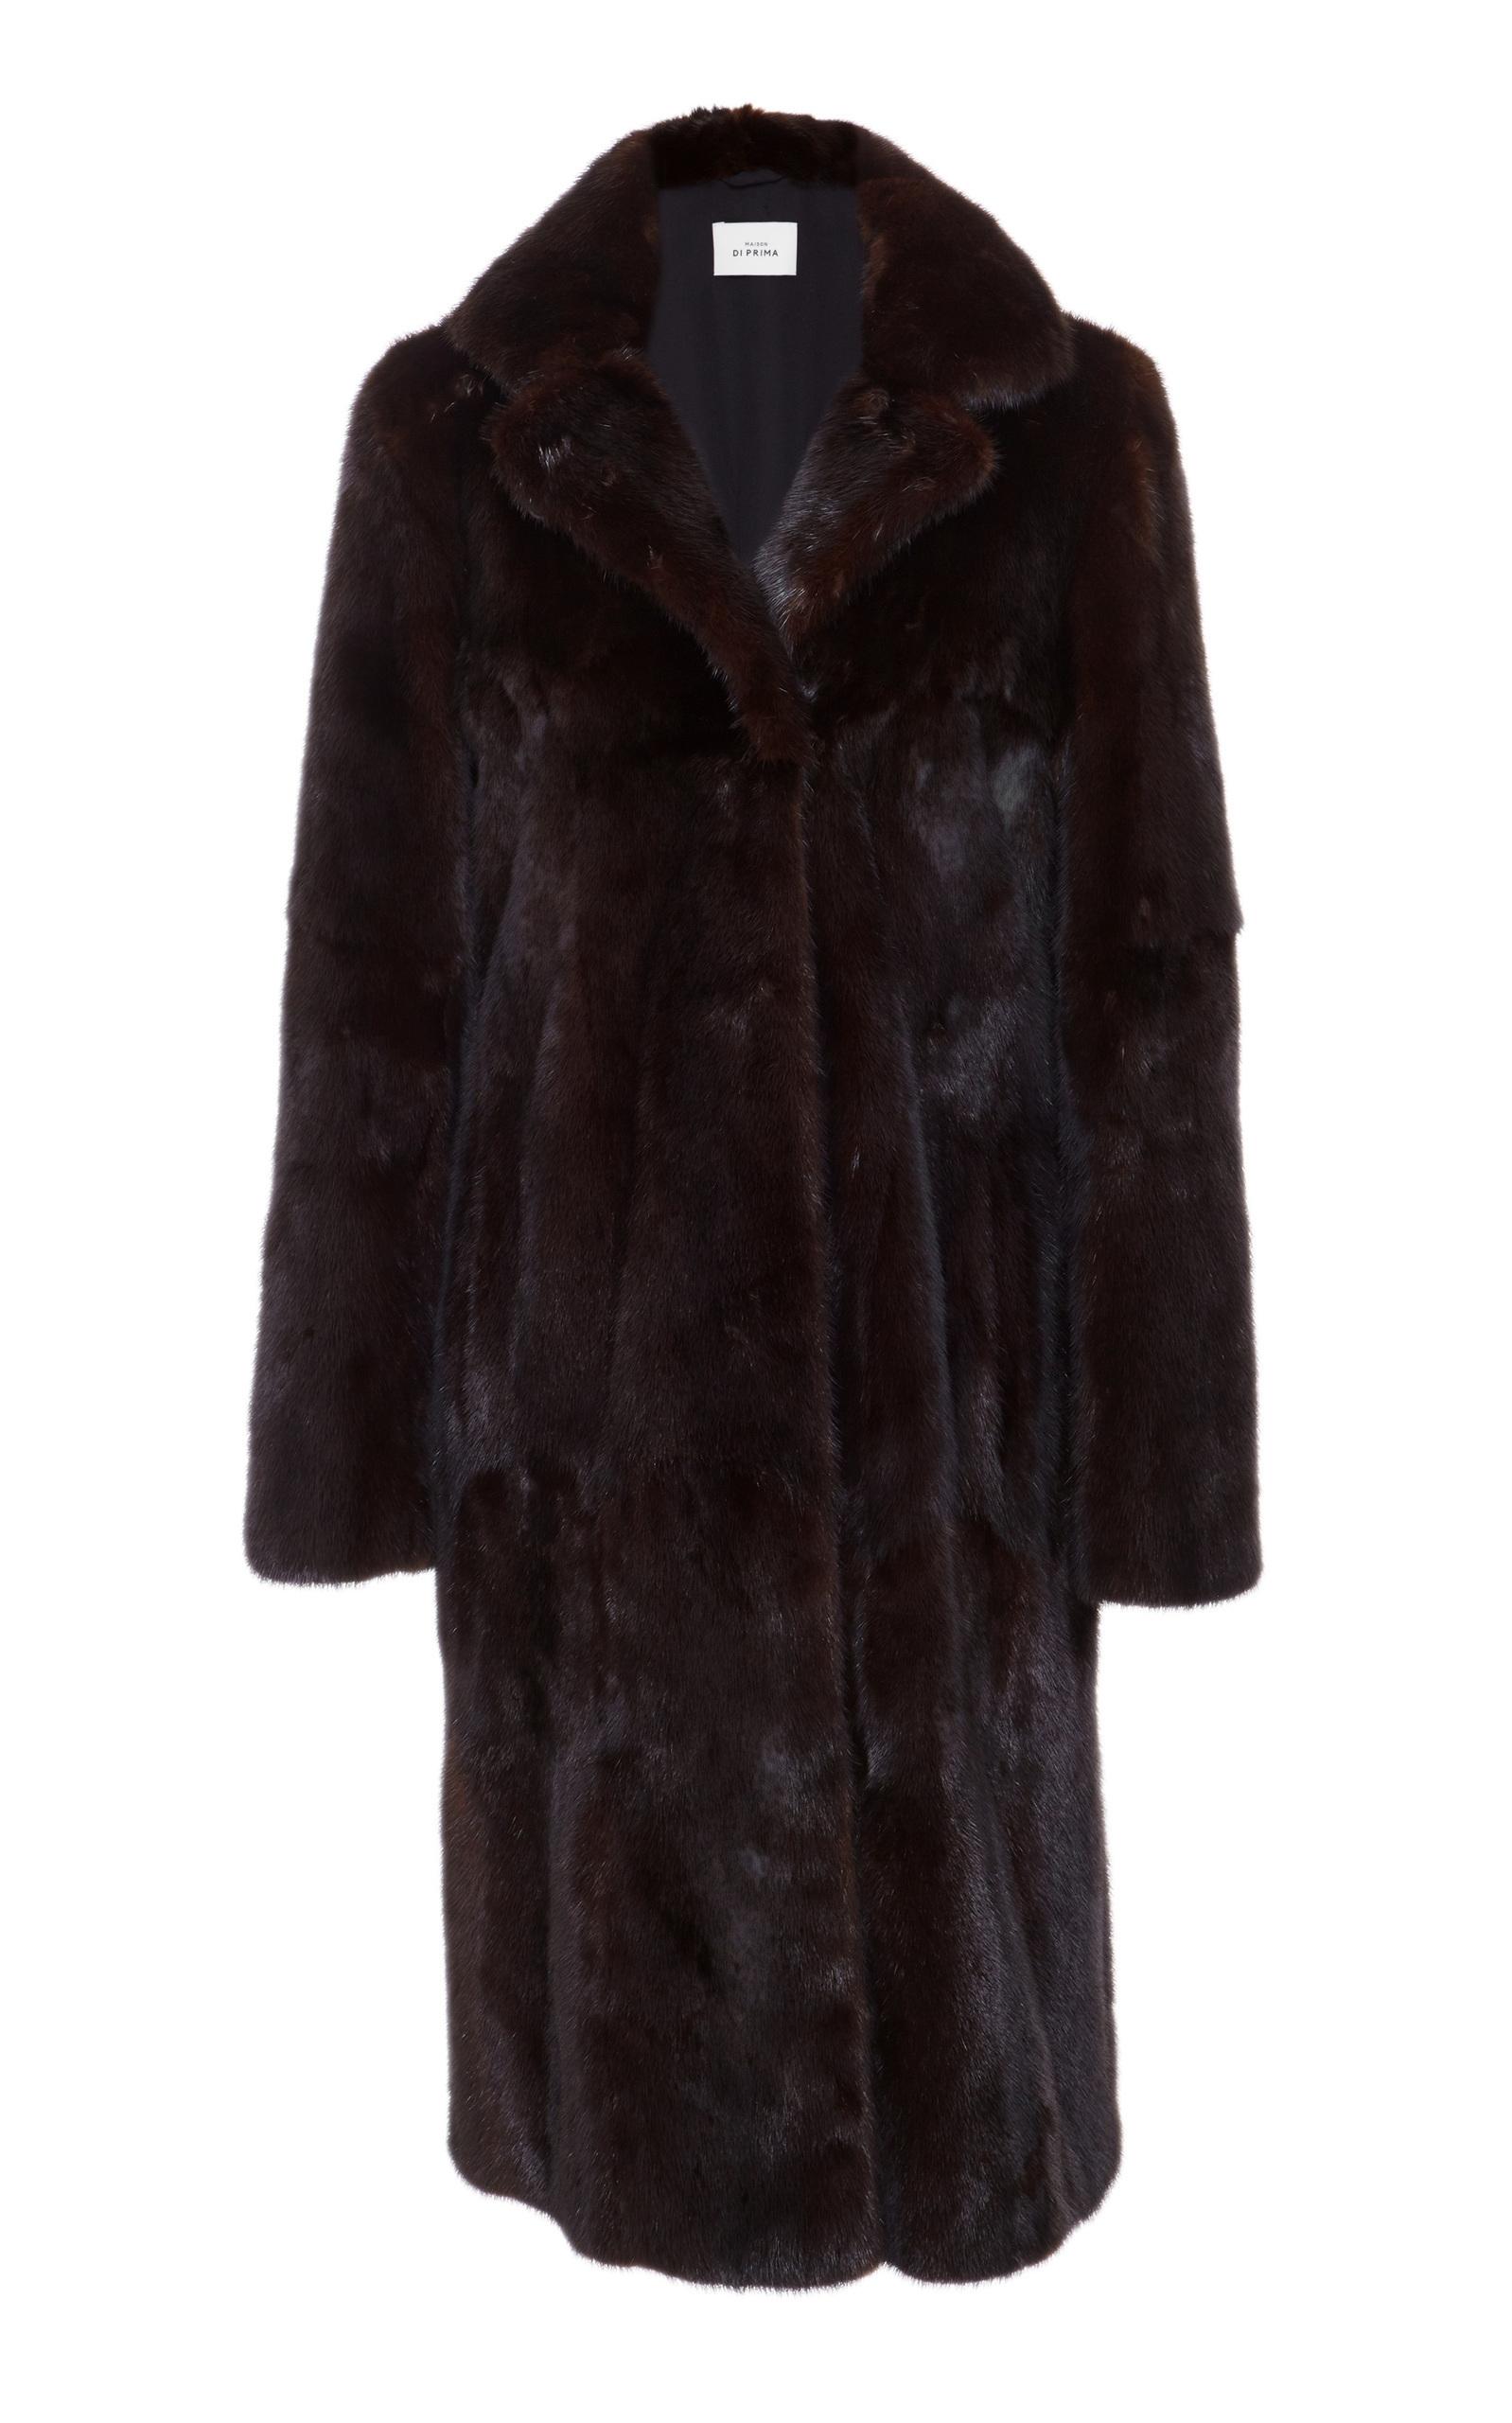 MAISON DI PRIMA Olivia Mink Fur Coat